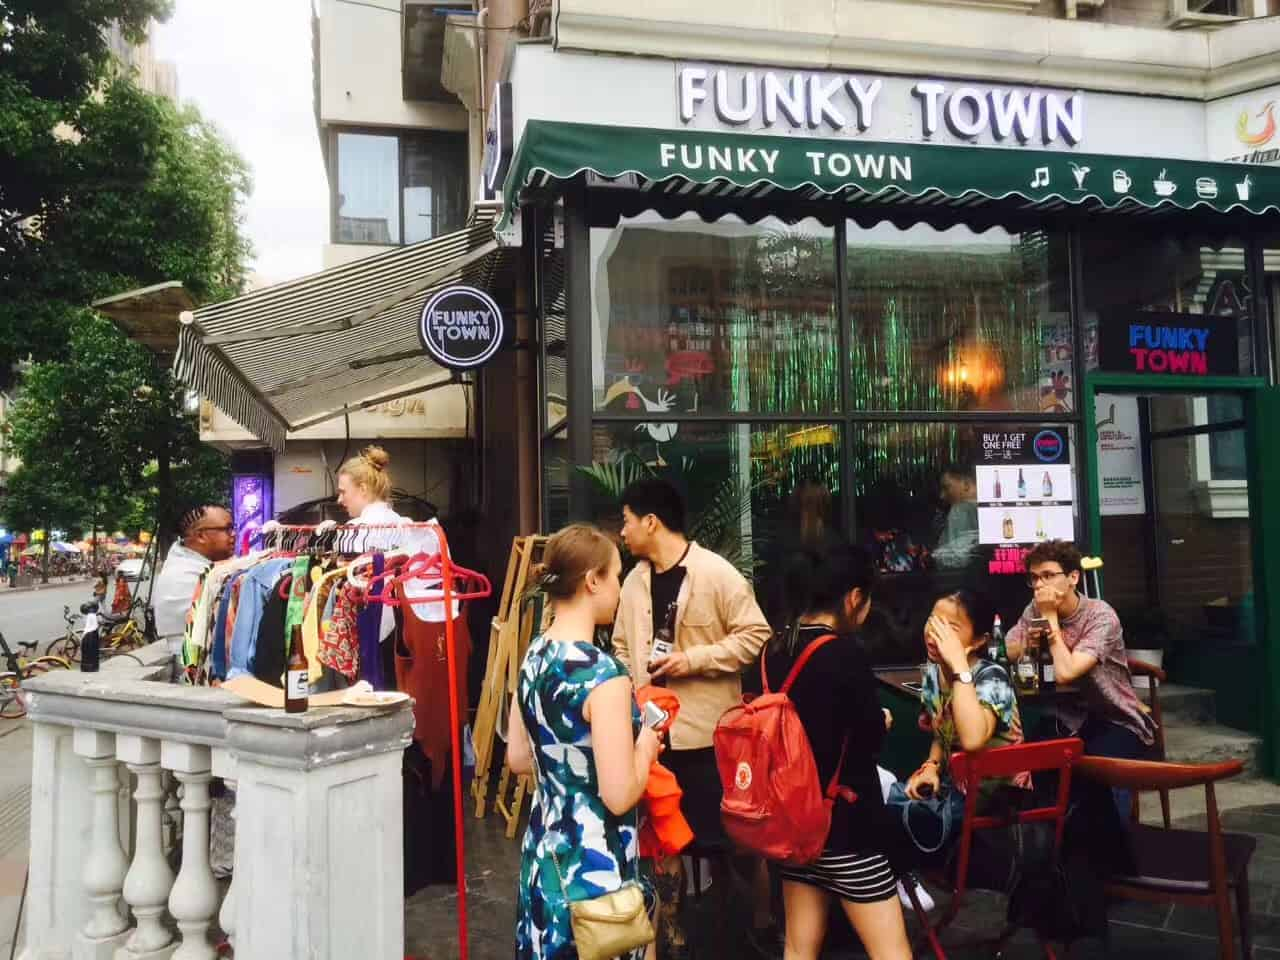 chengdu expat funky town door